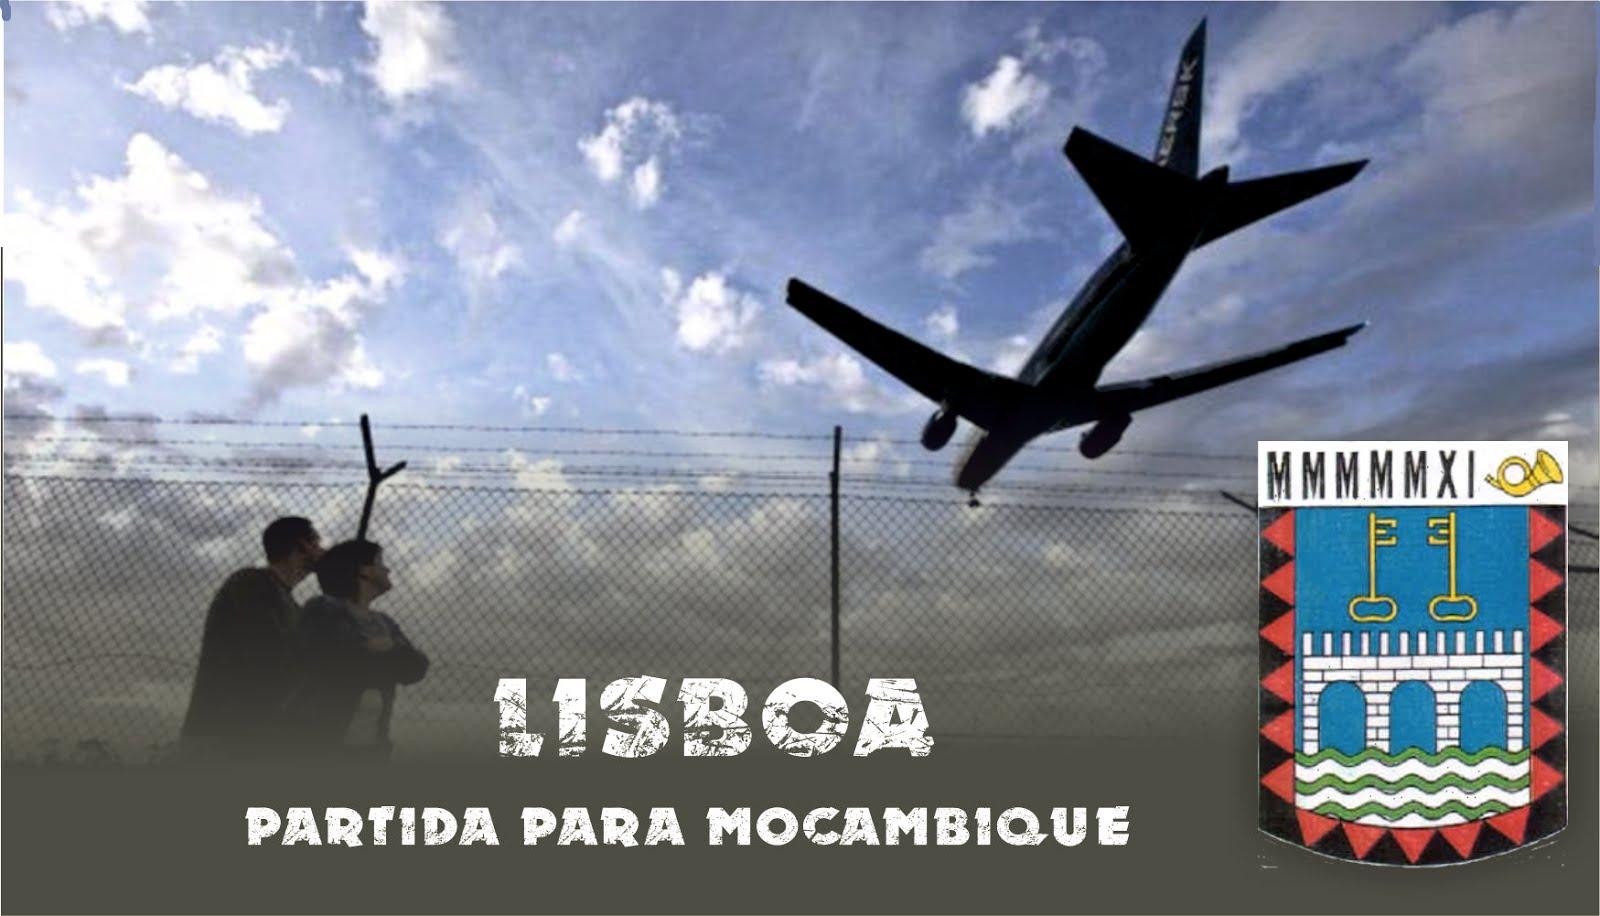 Lisboa - partida para Moçambique